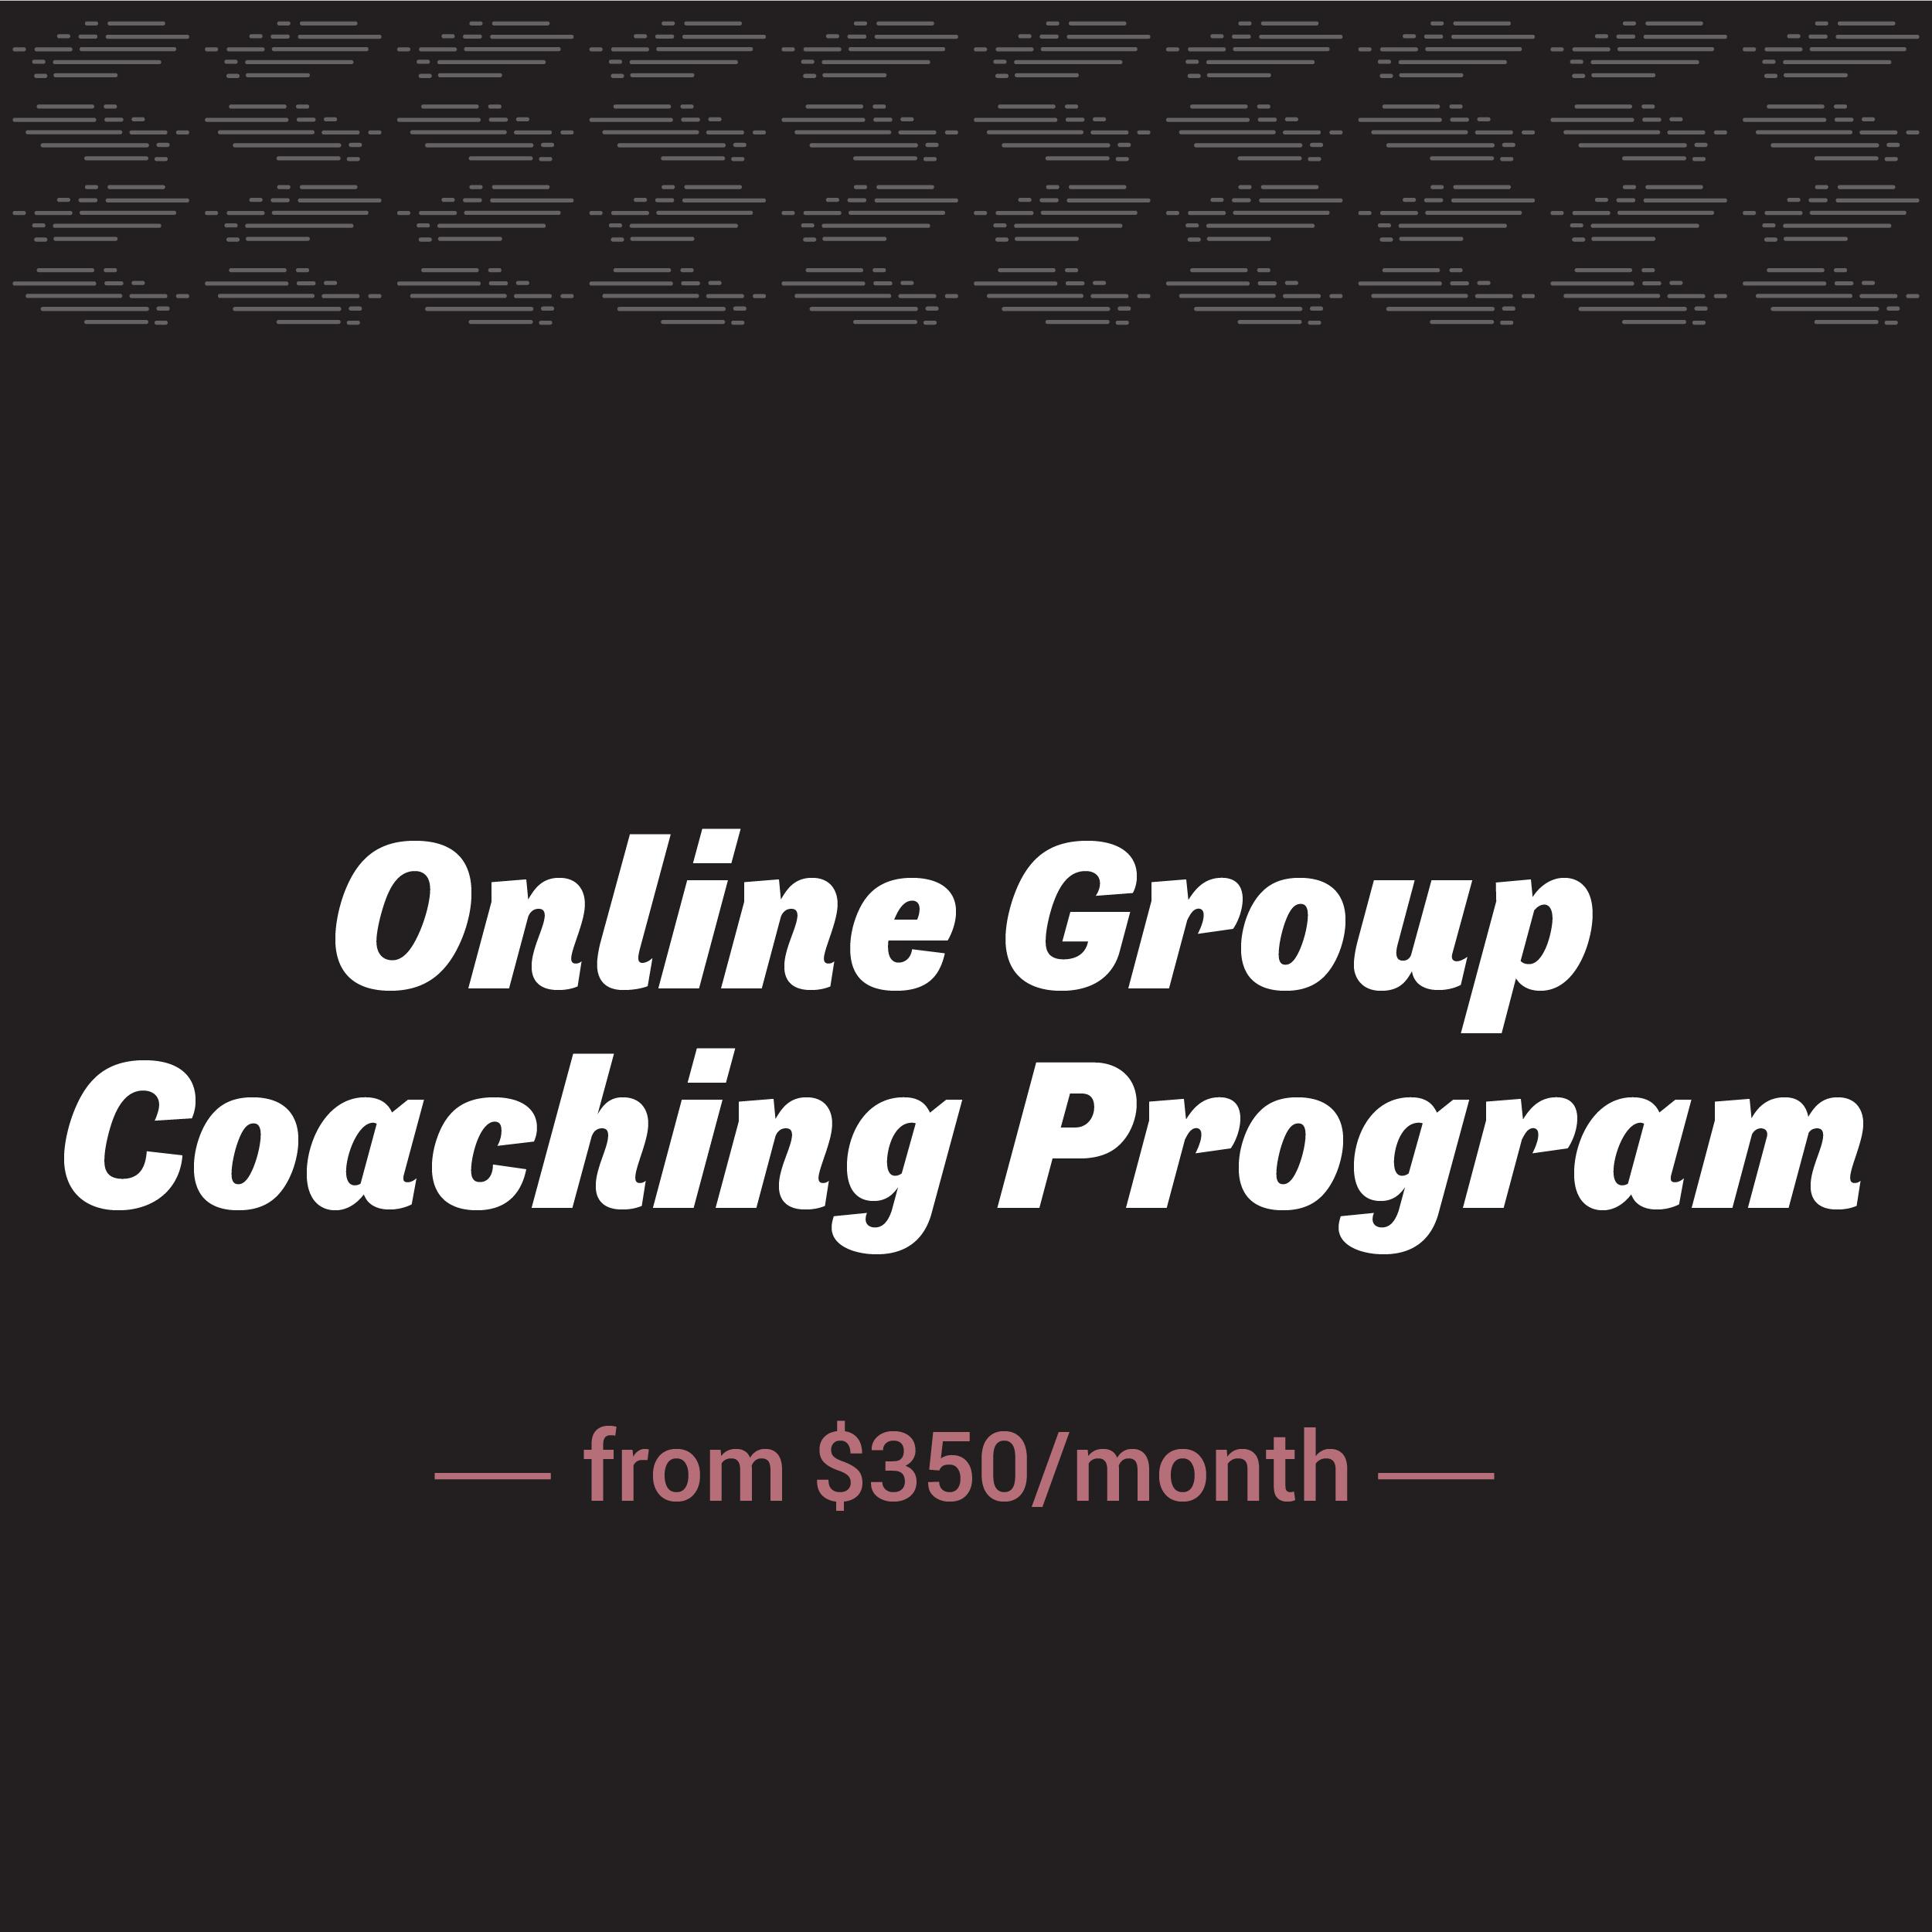 Online Group Coaching Program | Shakeout LLC